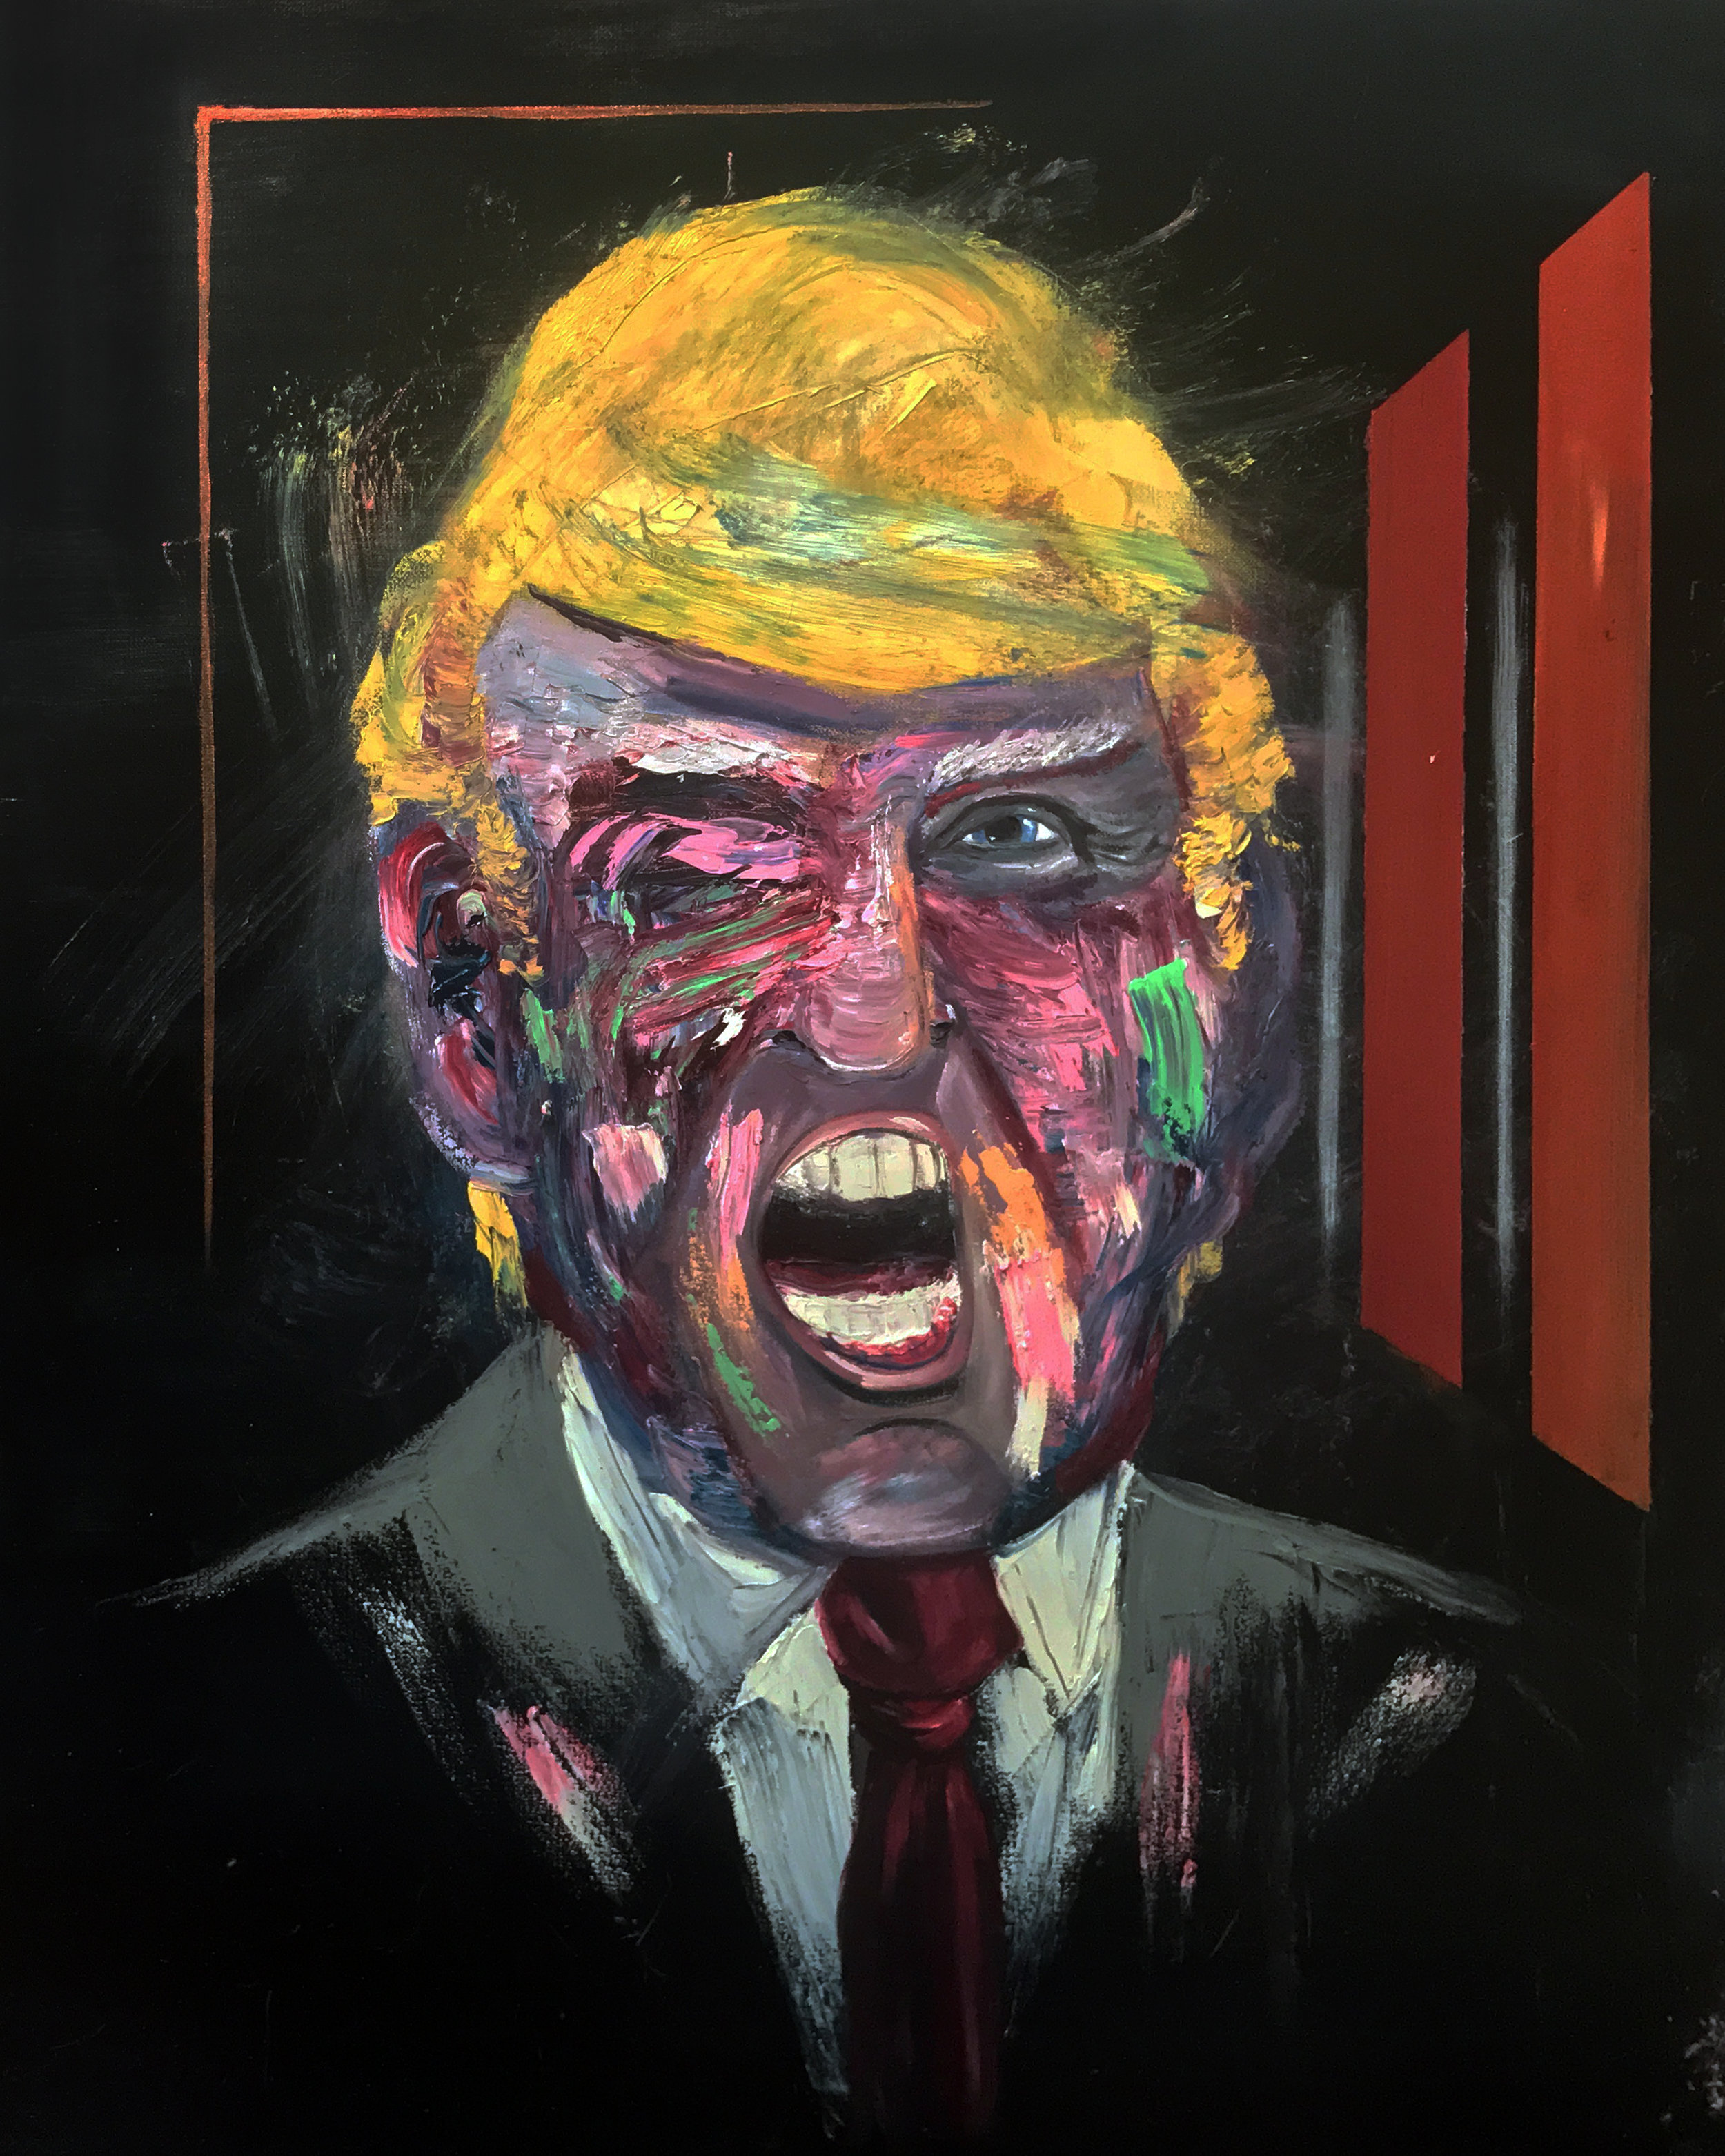 Deconstructed Portrait of Donald Trump.